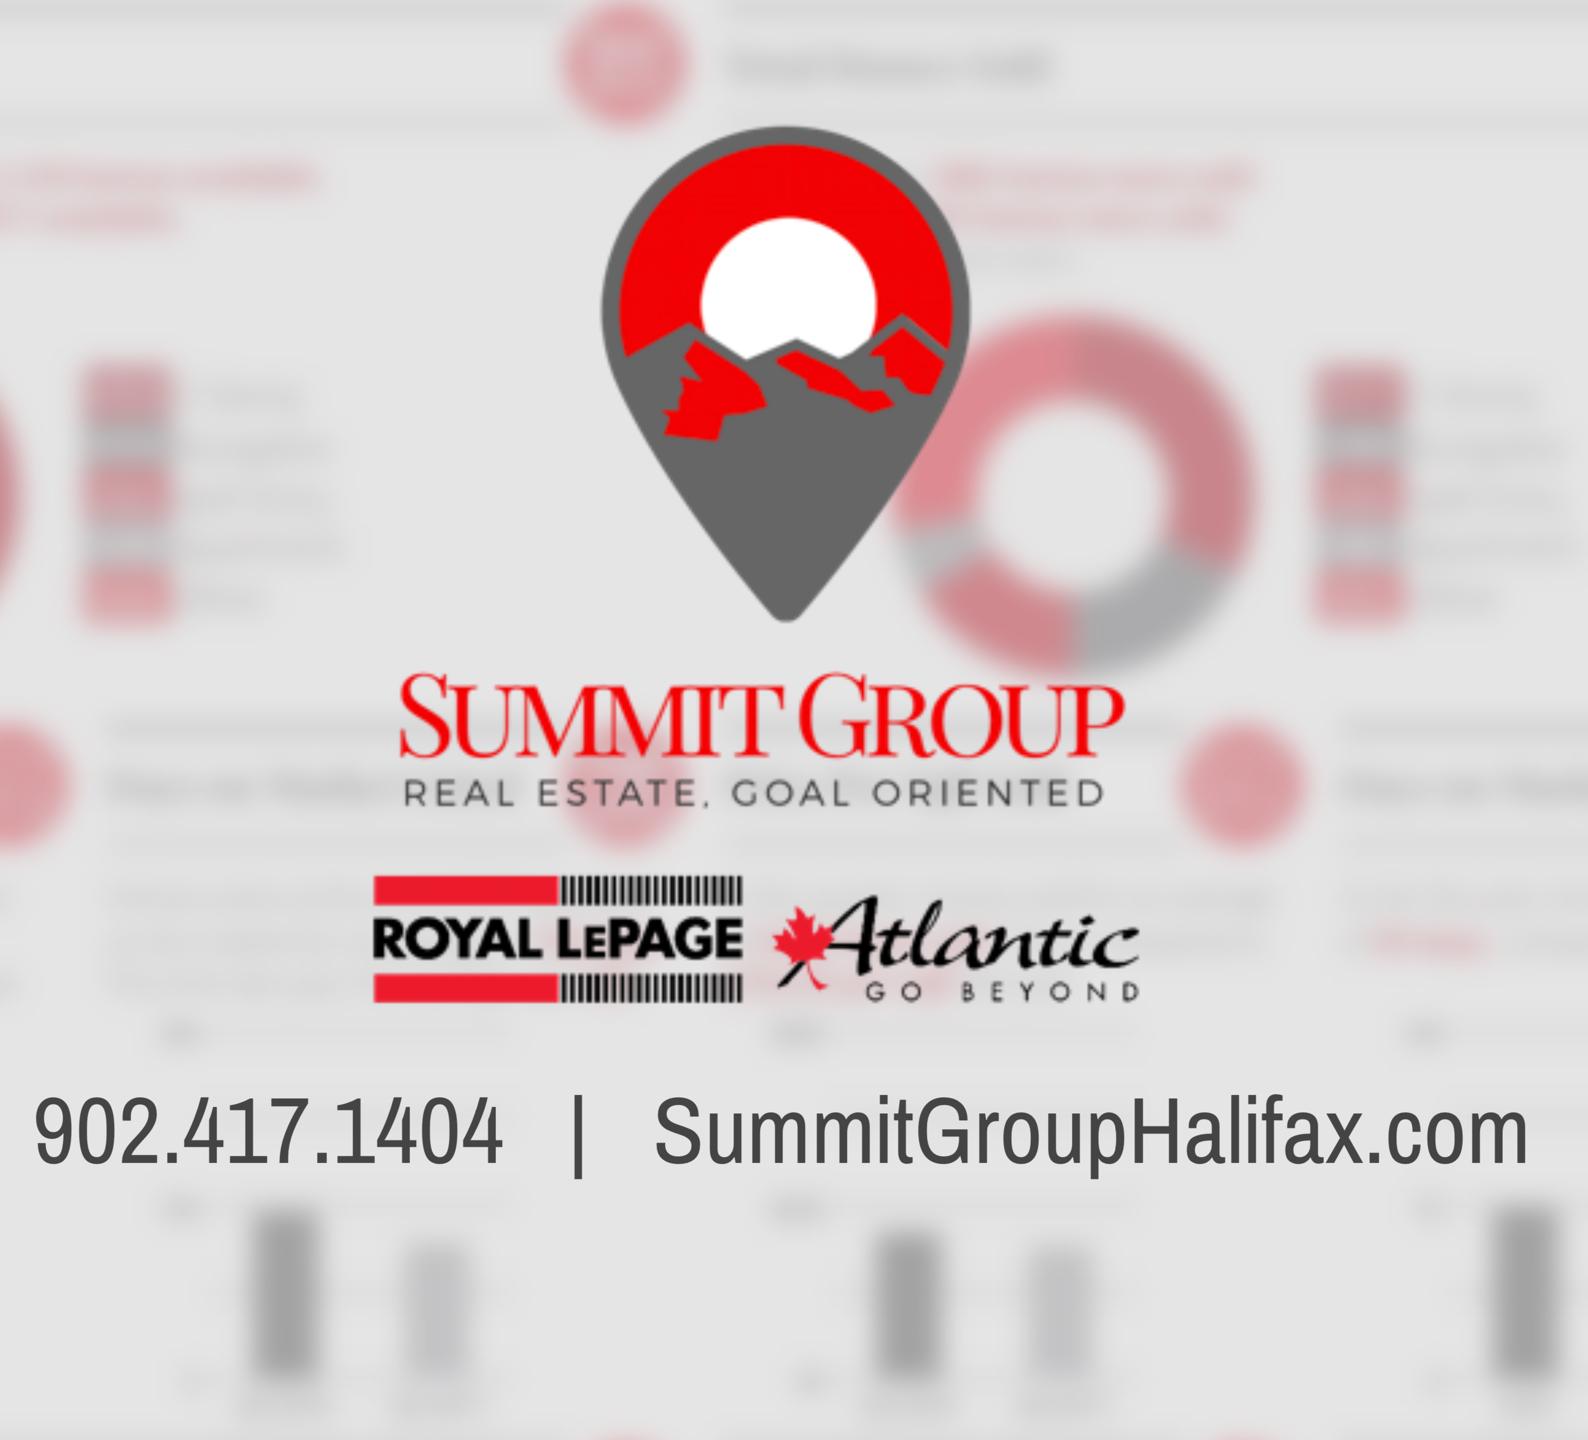 Summit Group - Royal LePage Atlantic